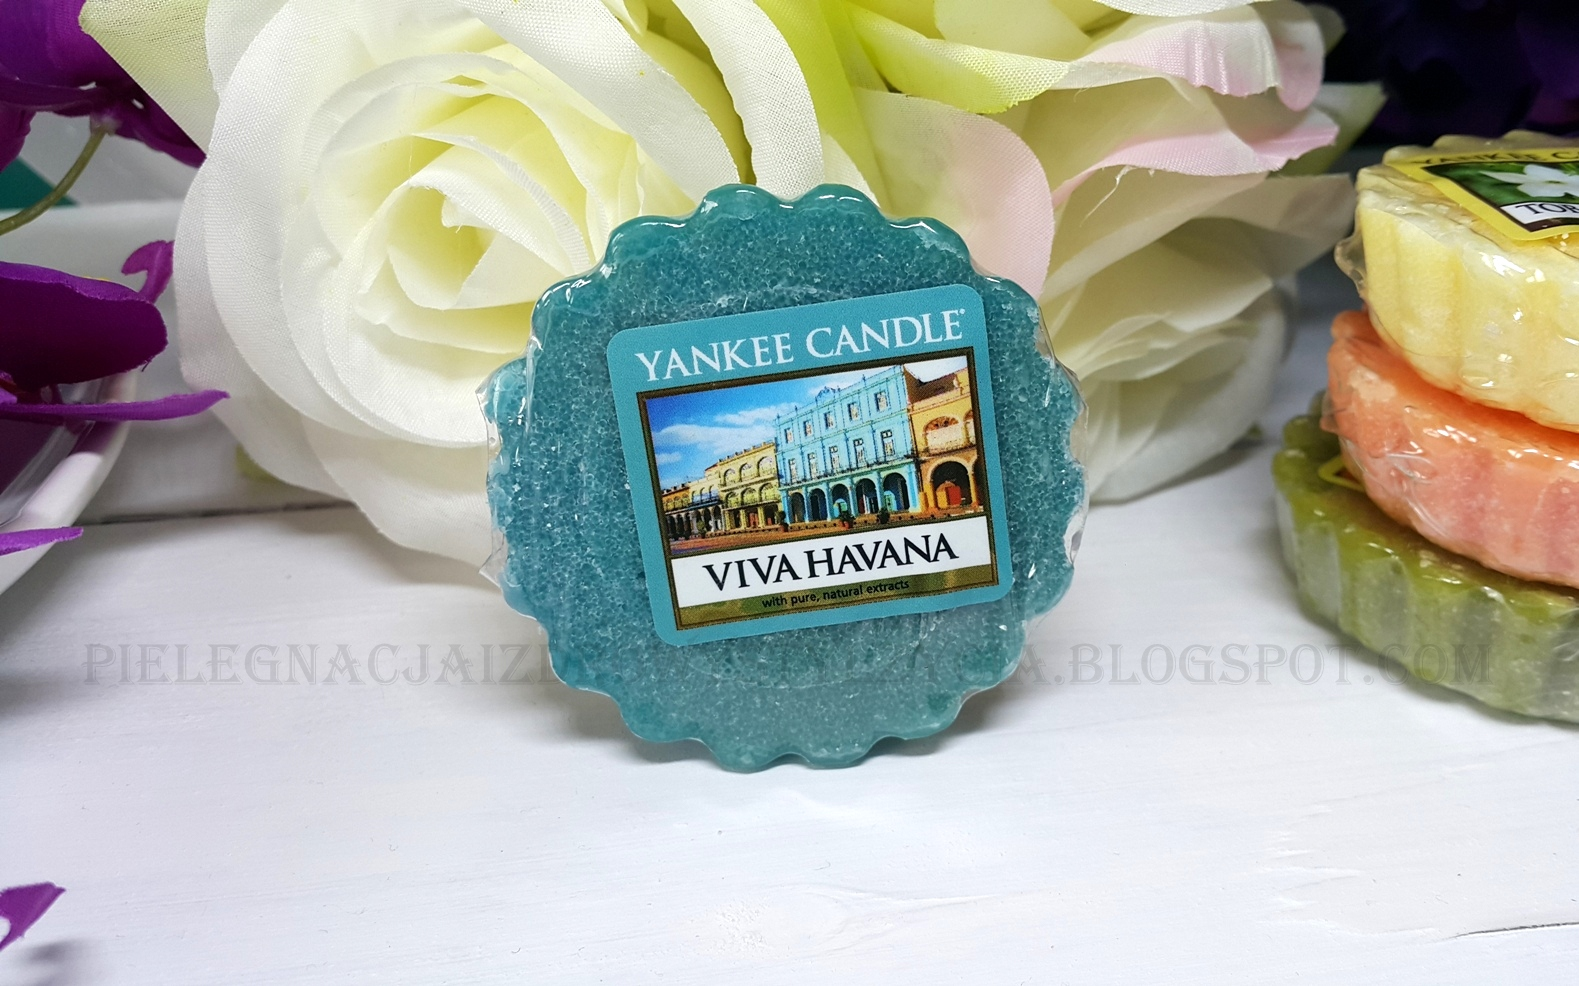 Viva Havana Yankee Candle